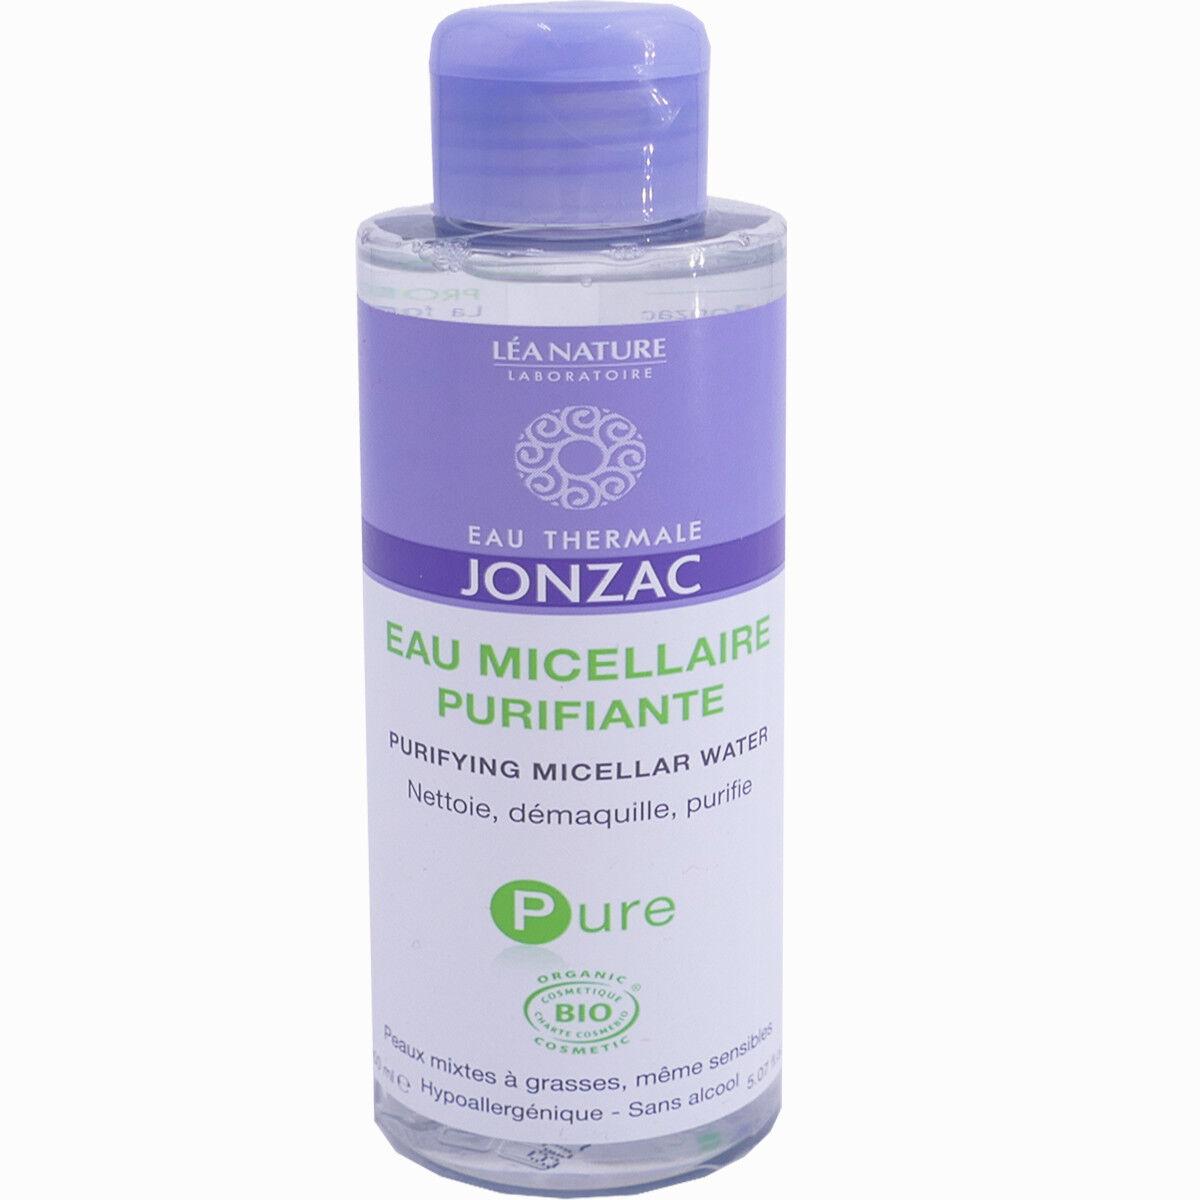 Jonzac eau micellaire purifiante bio 150 ml